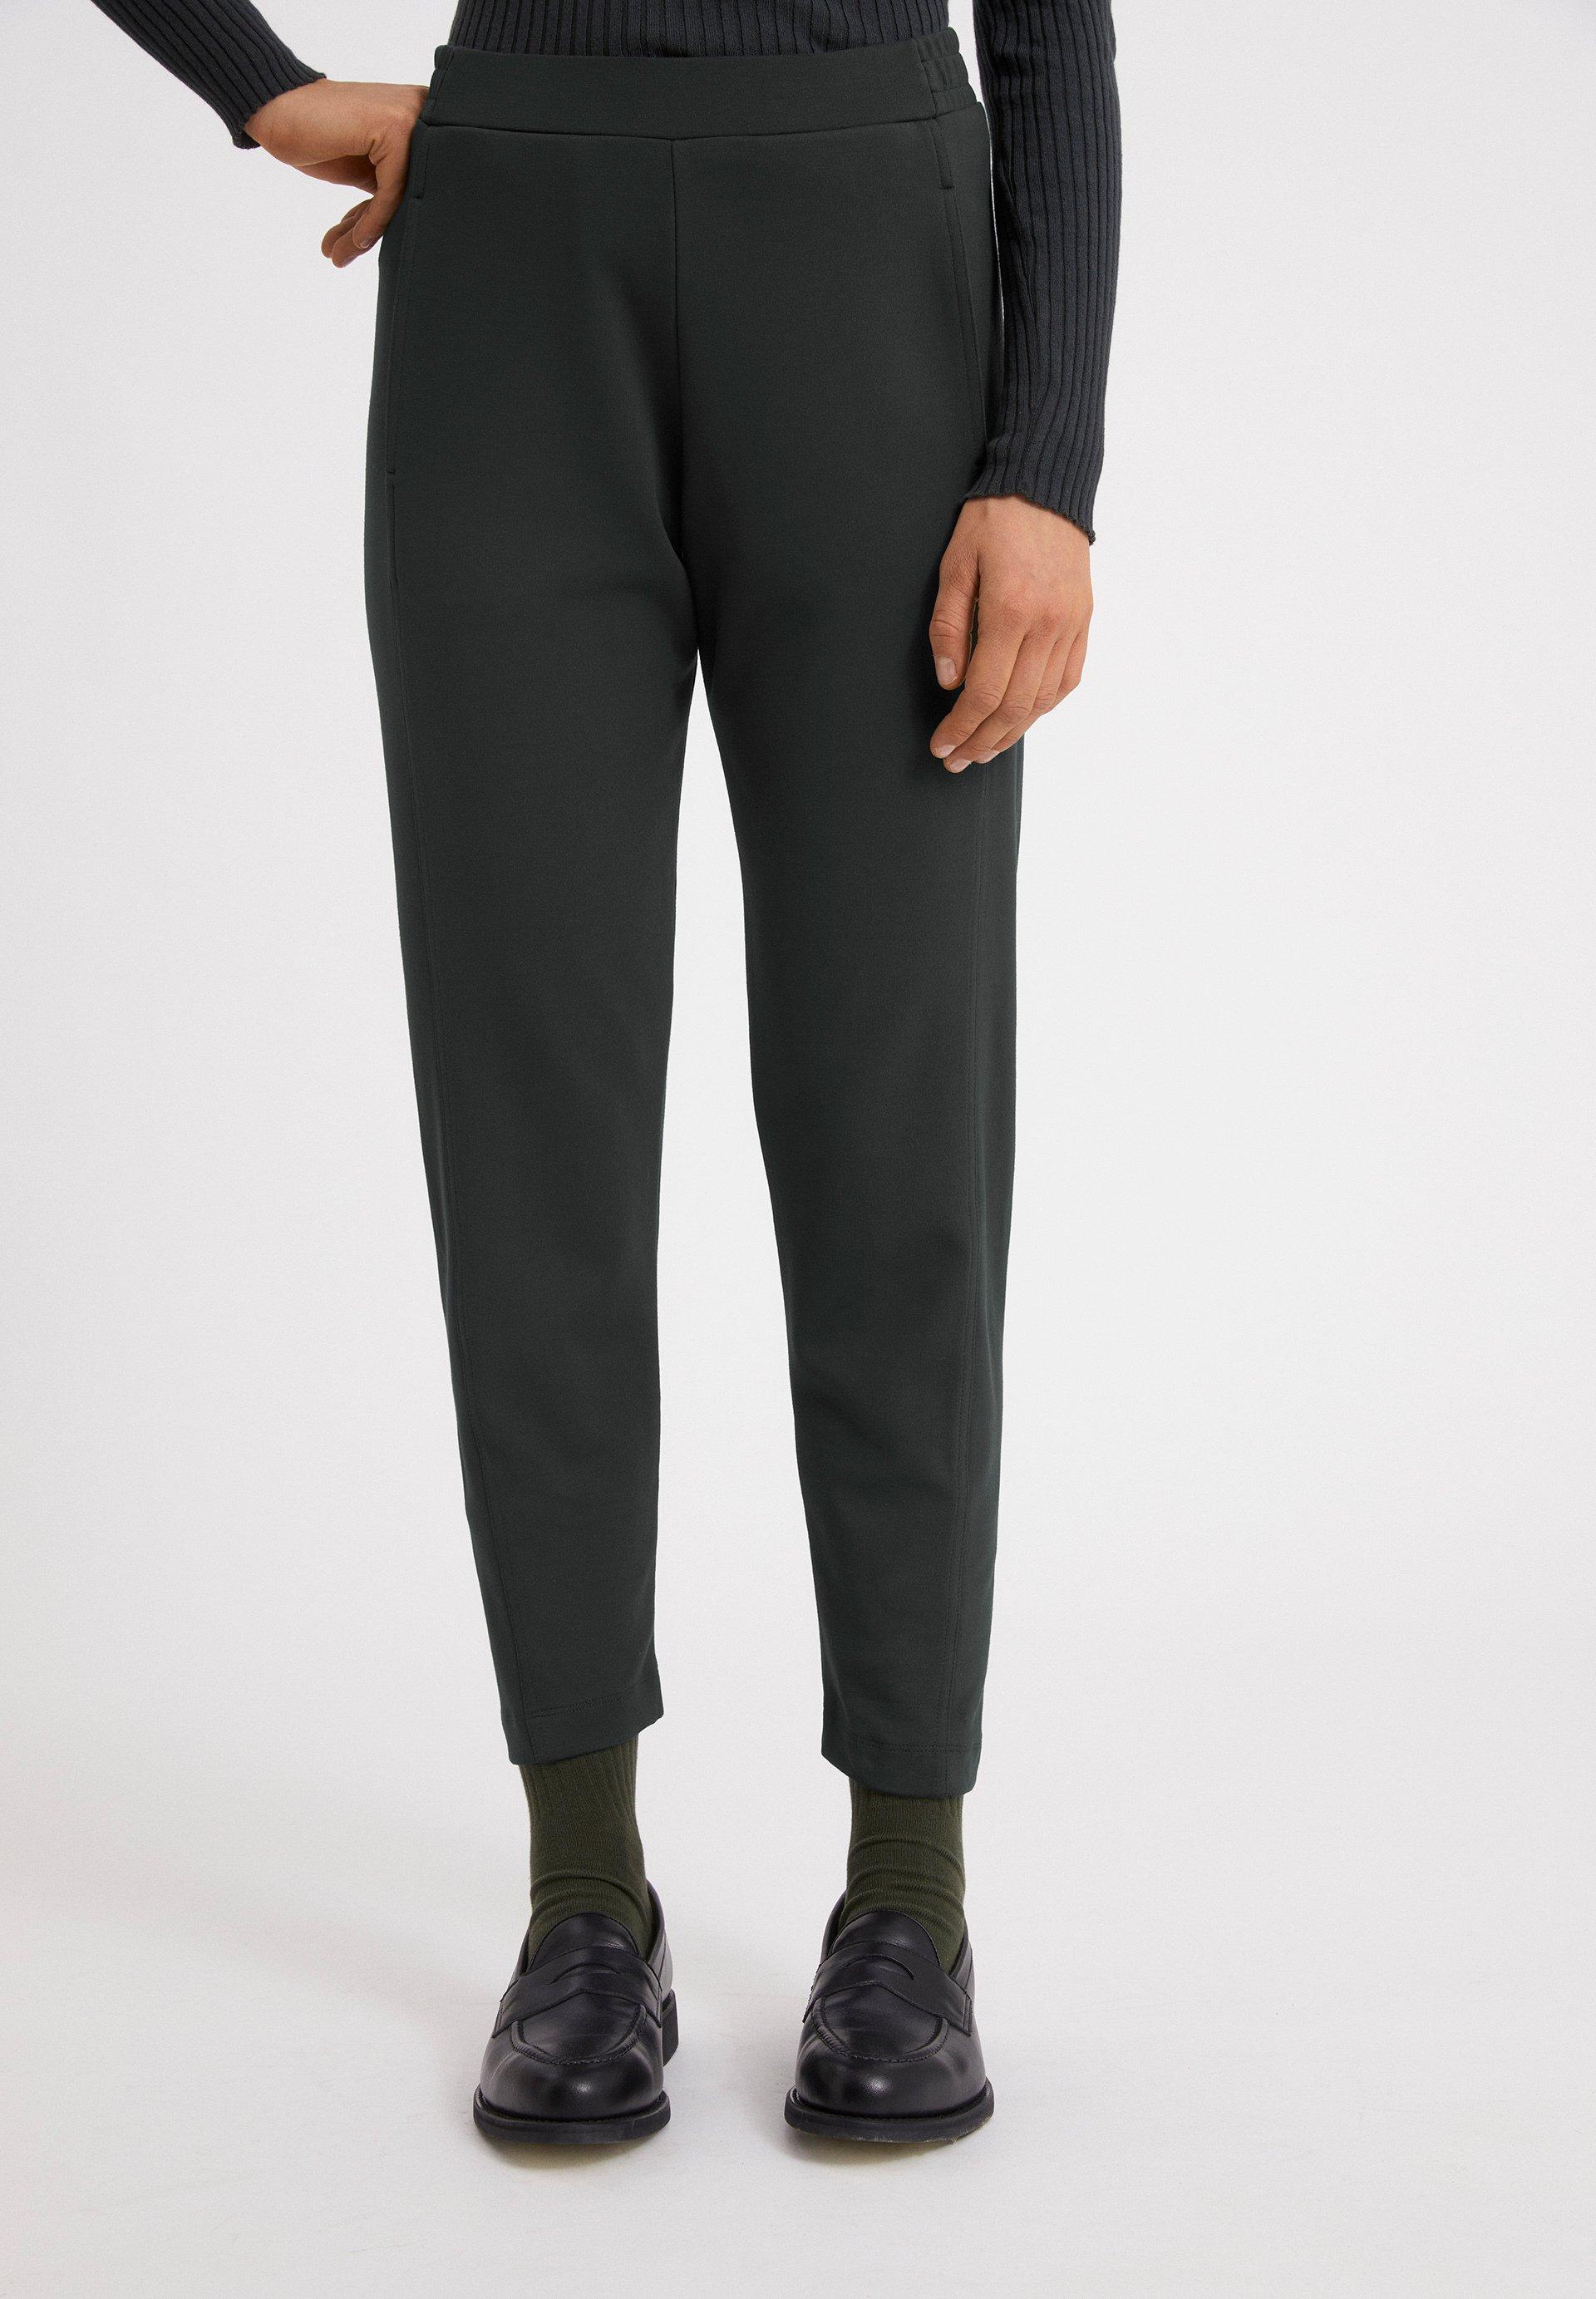 Femme MAGDAA MAGDAA - Pantalon classique